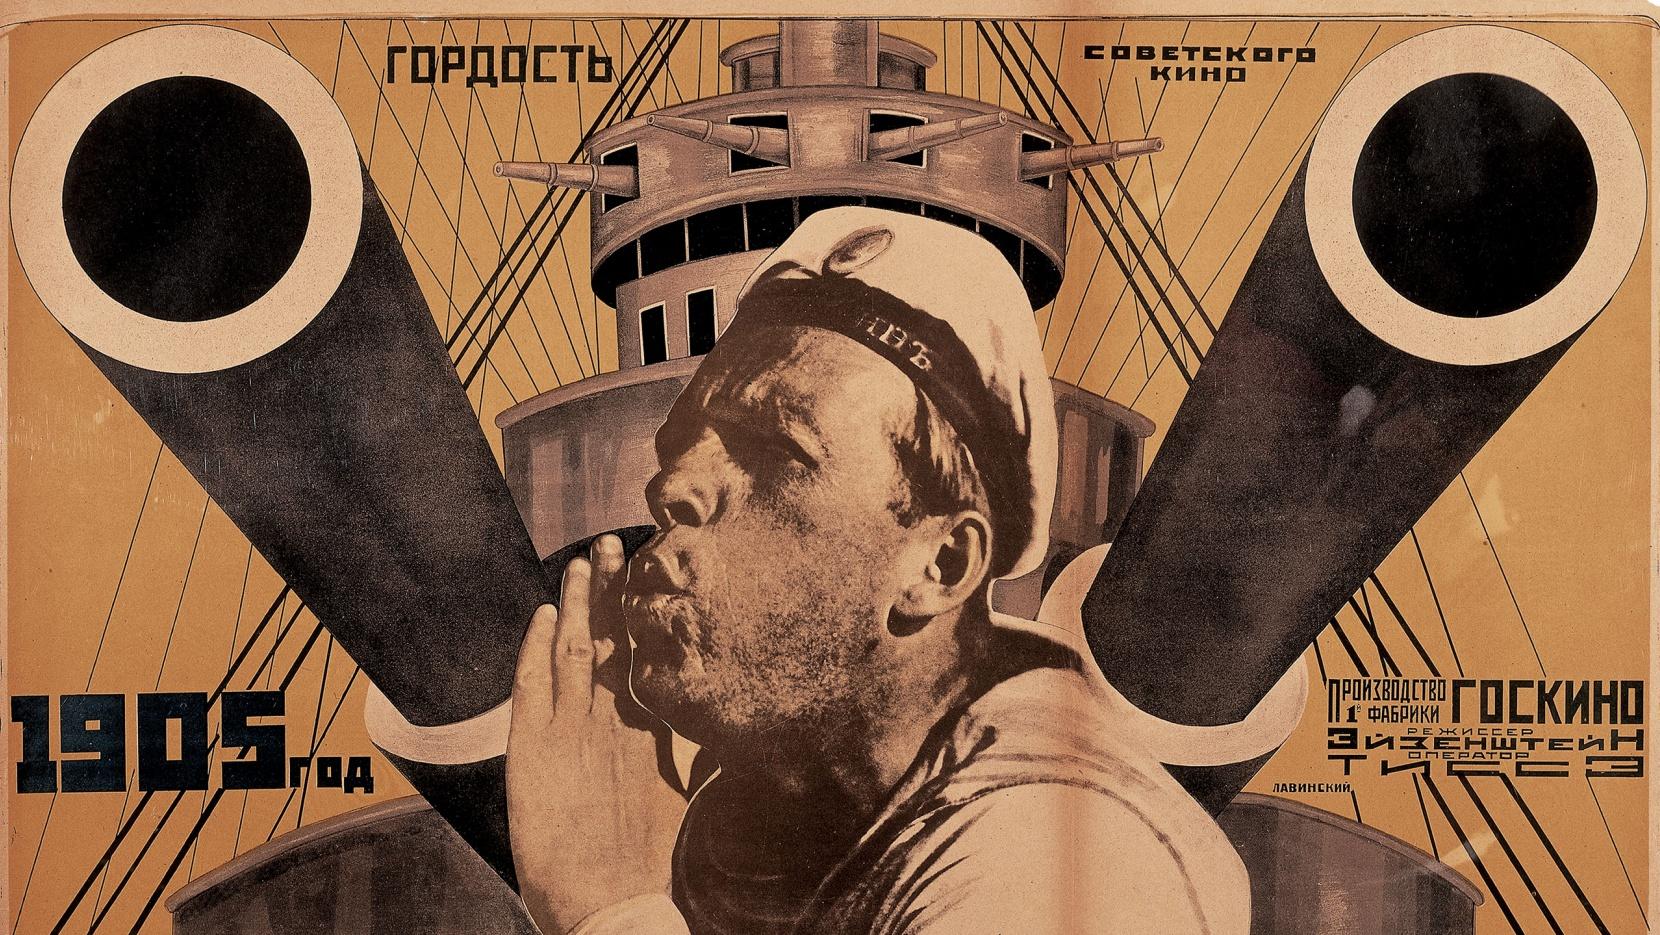 Battleship potemkin movie download